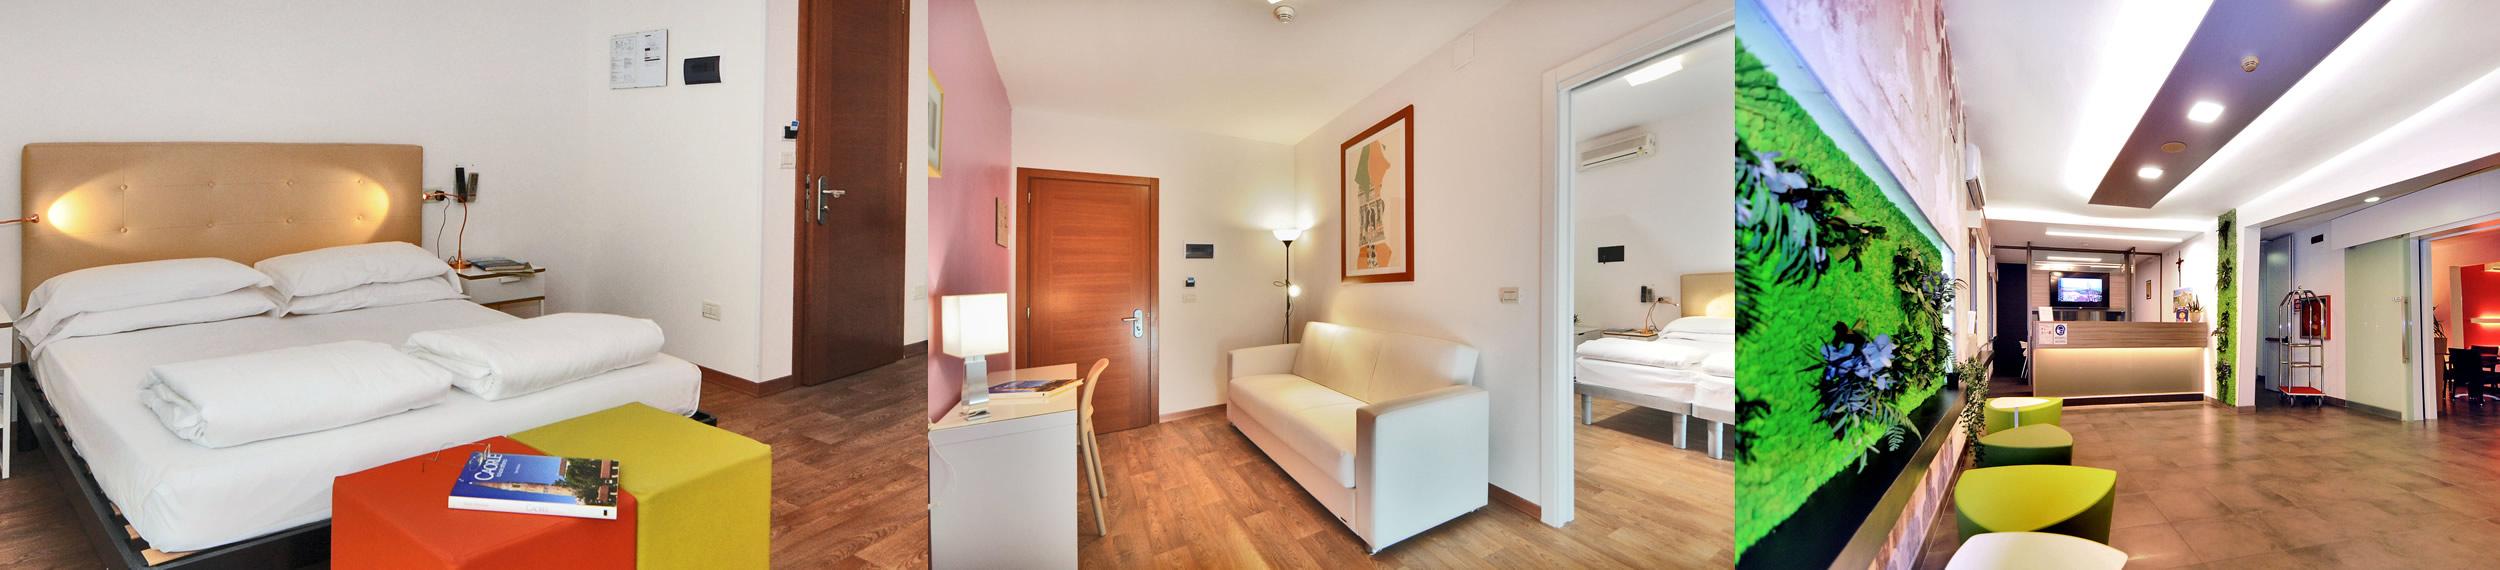 Hotel Nederland - Caorle (Venice)